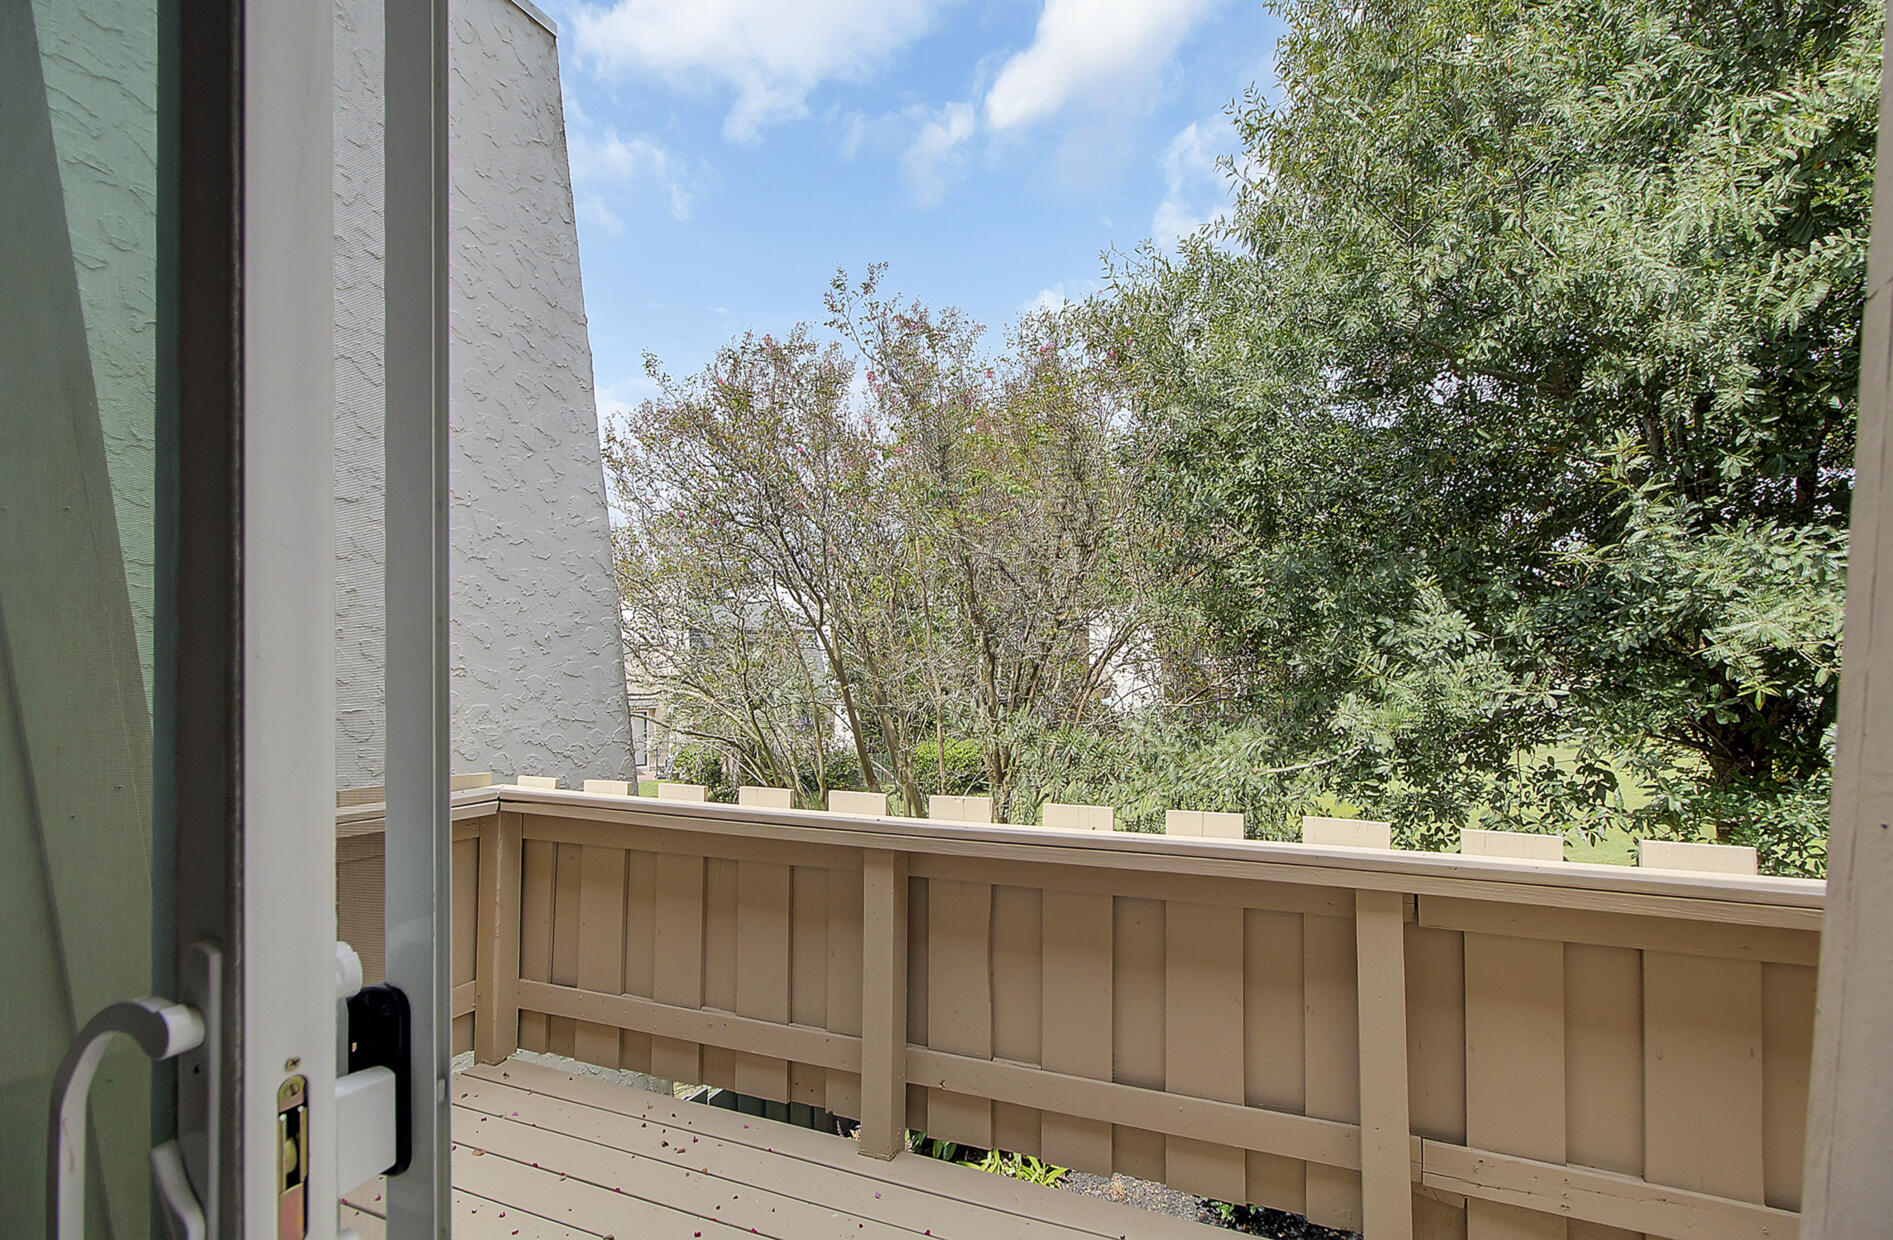 Snee Farm Homes For Sale - 504 Ventura, Mount Pleasant, SC - 32